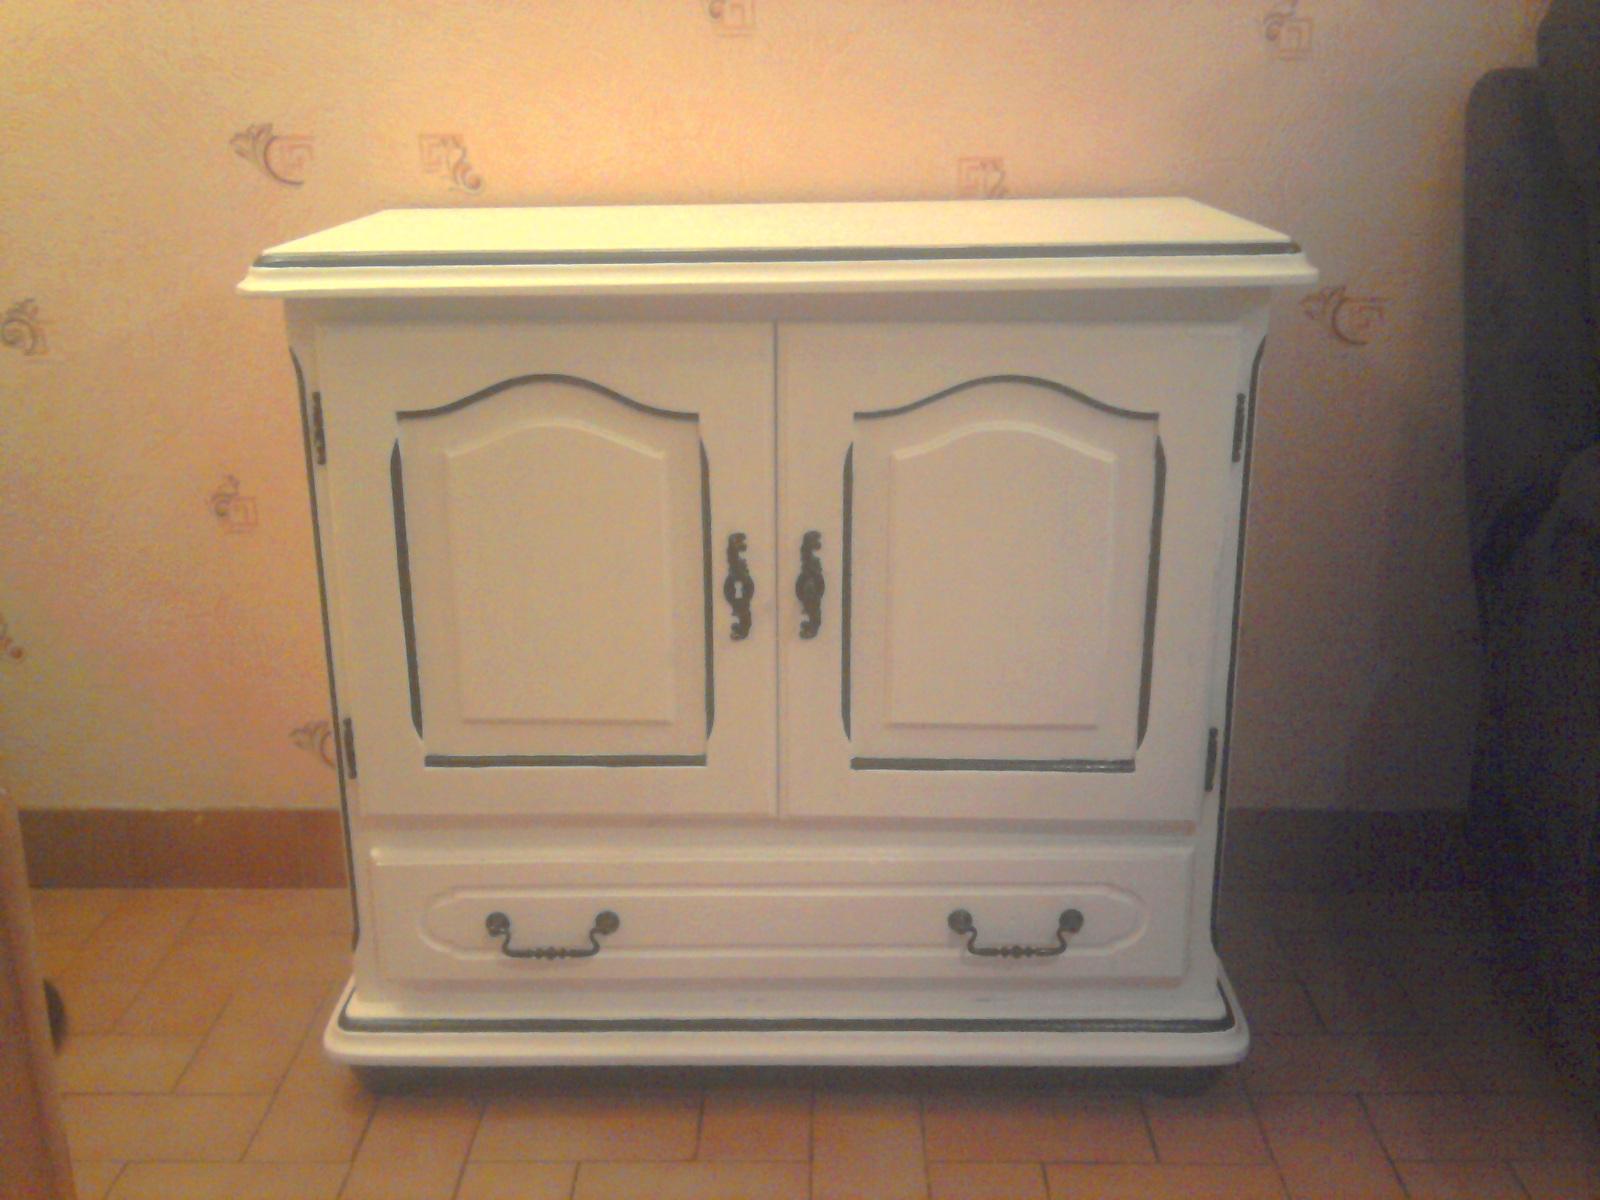 rangement meuble tv ancien peint blanc